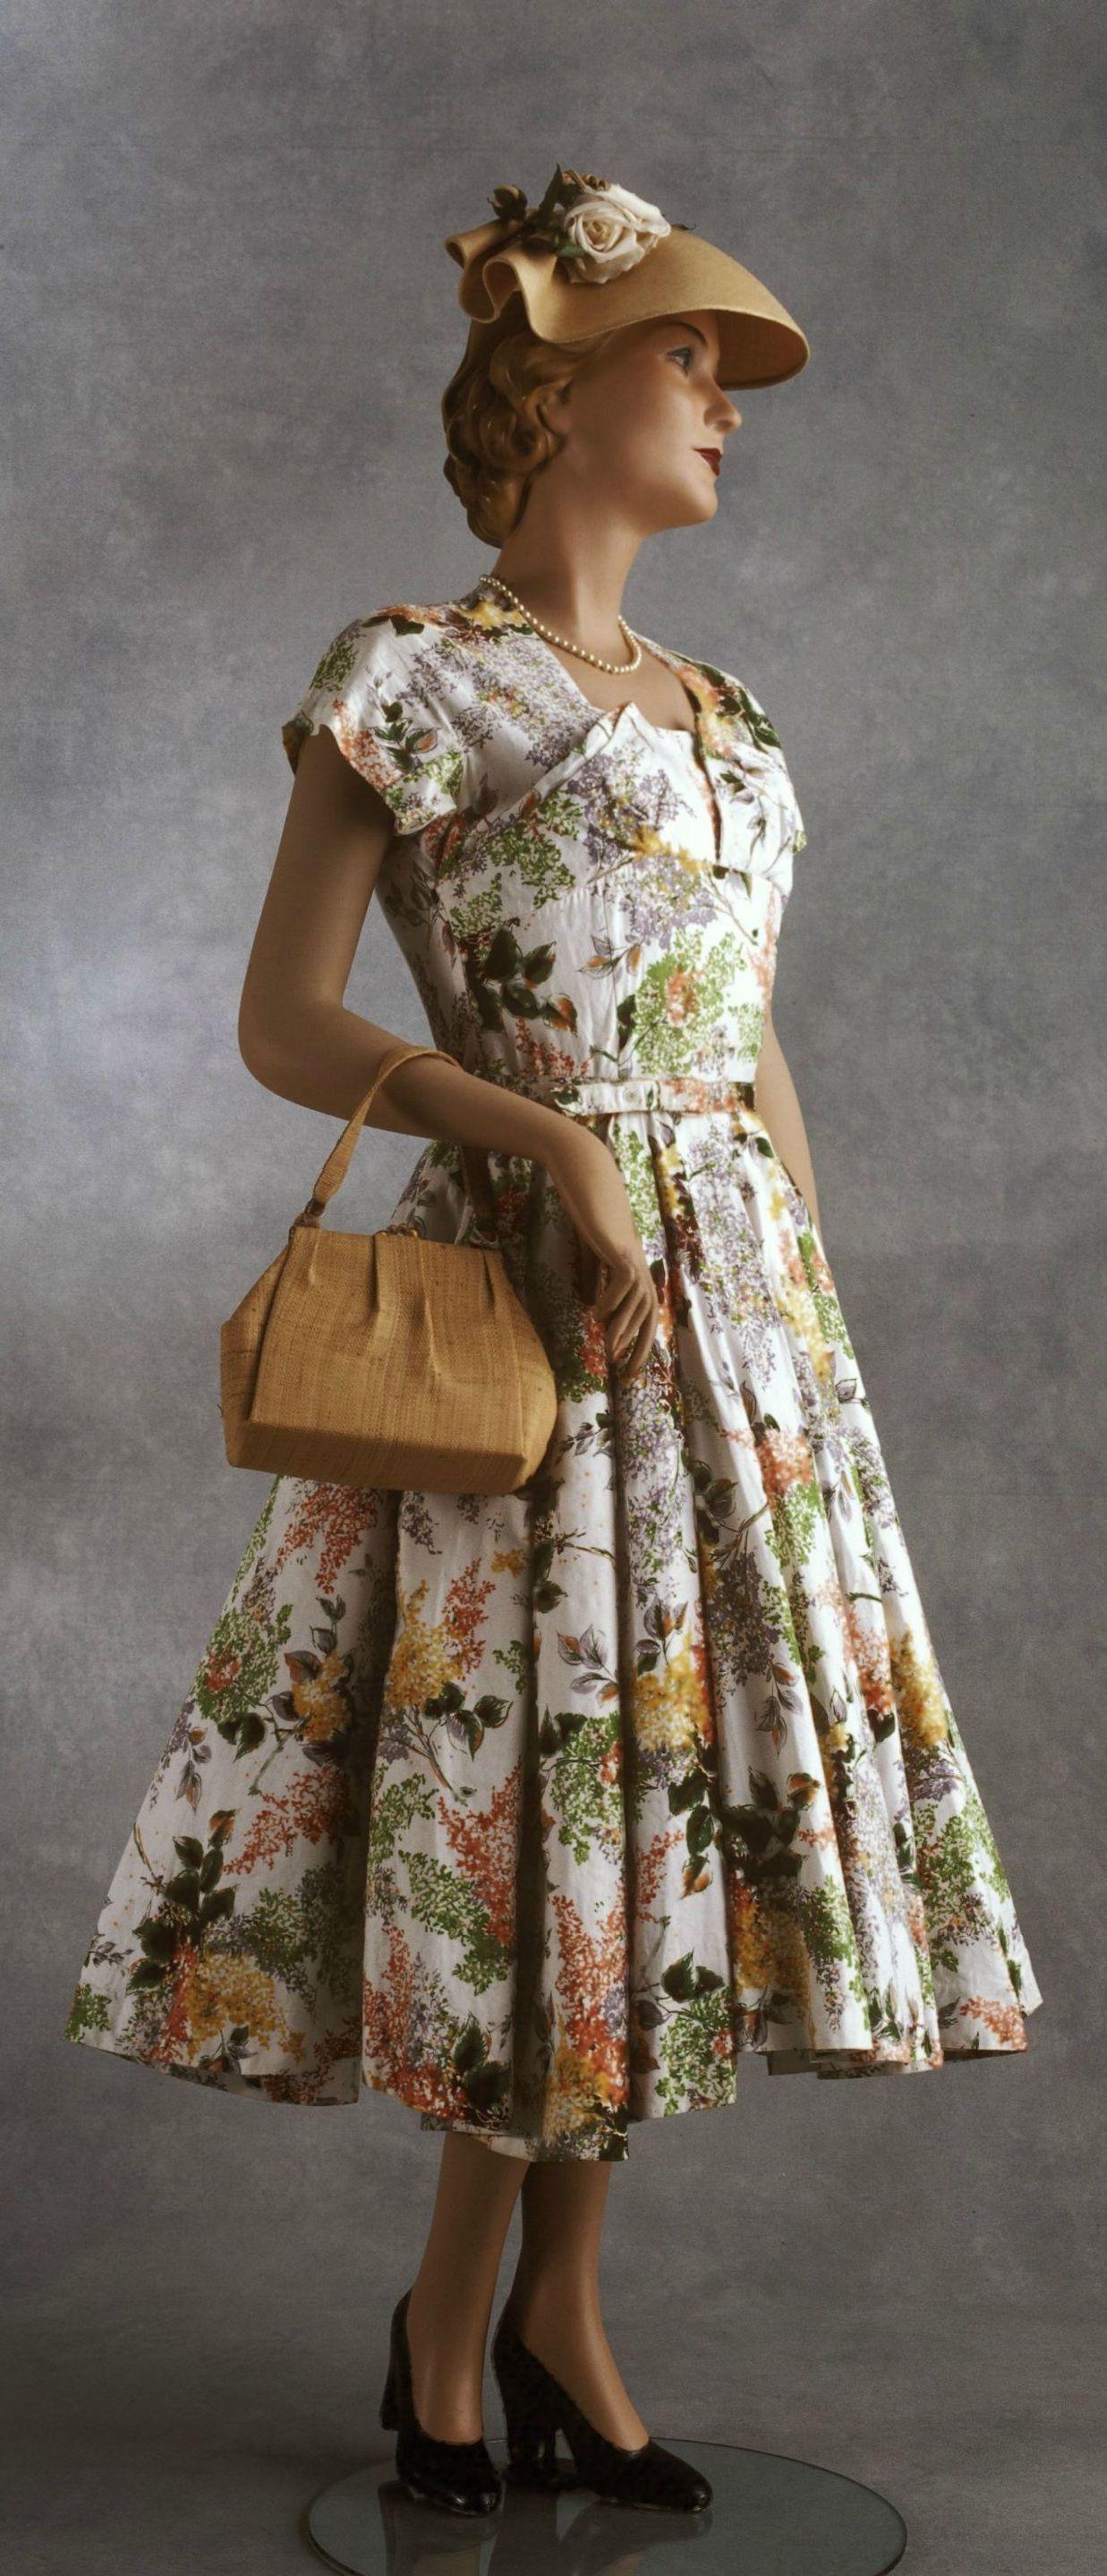 Day Dress, Ridley's of Sydney (Sydney, New South Wales